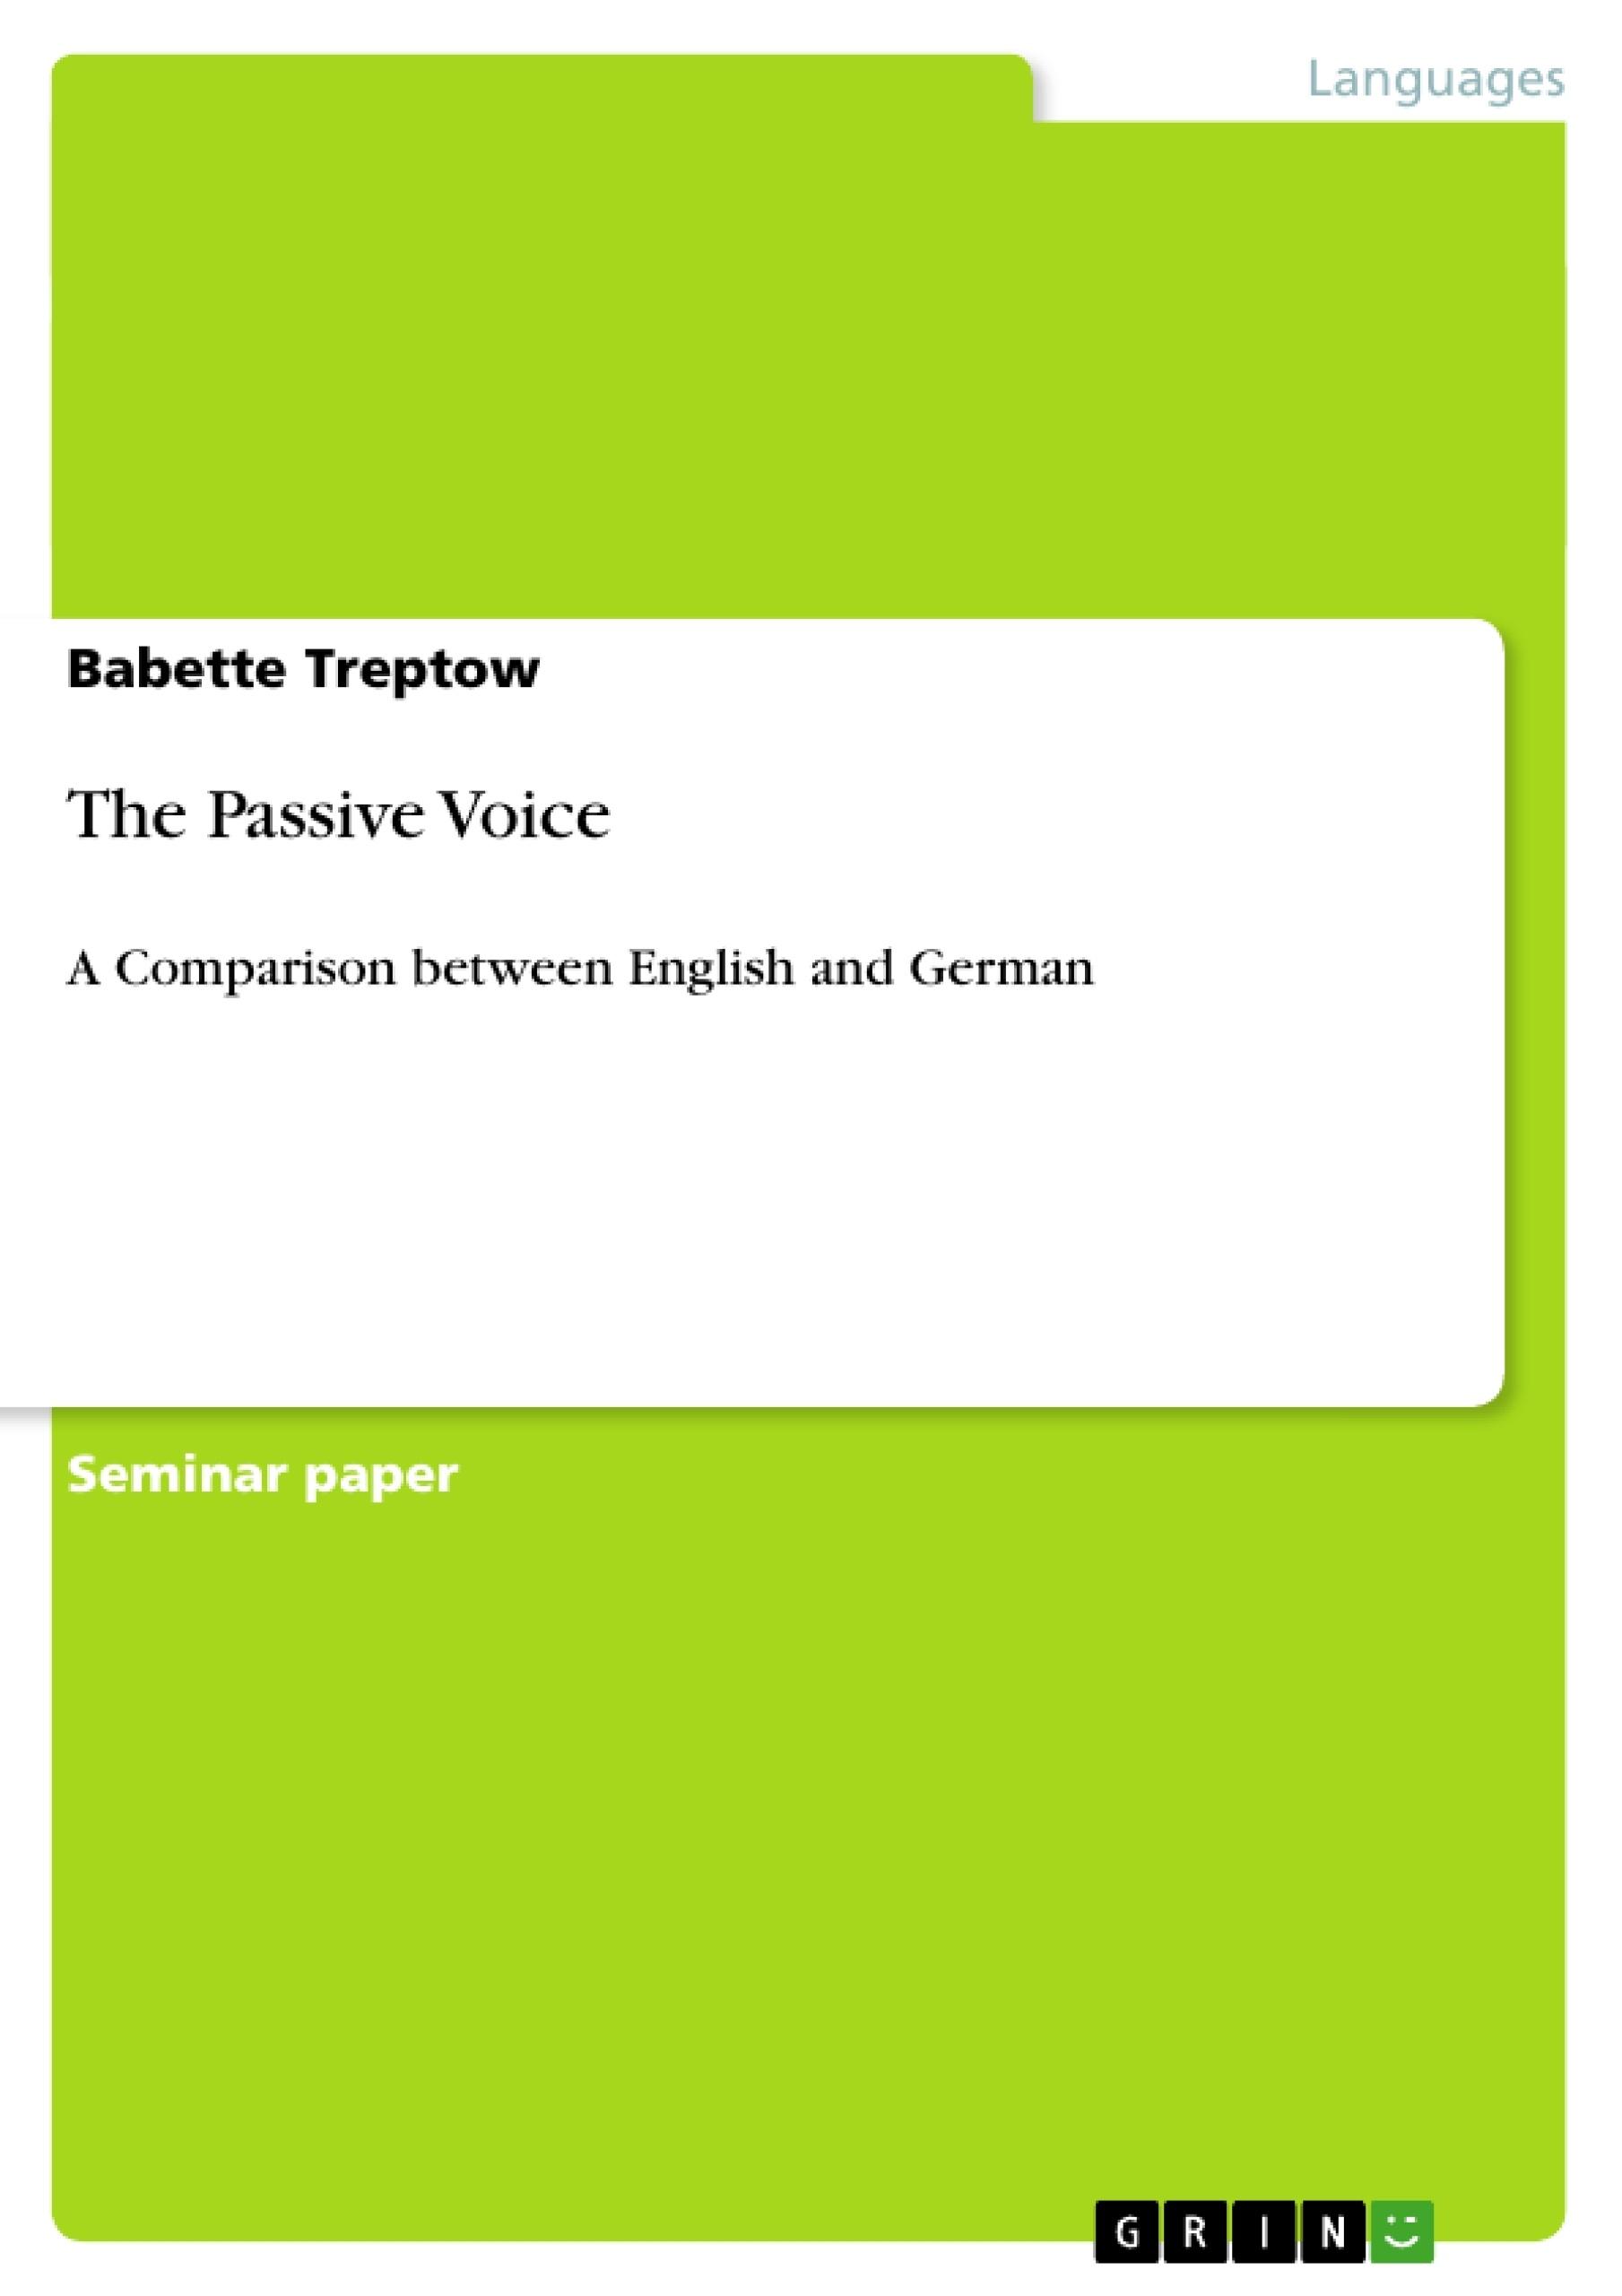 Title: The Passive Voice